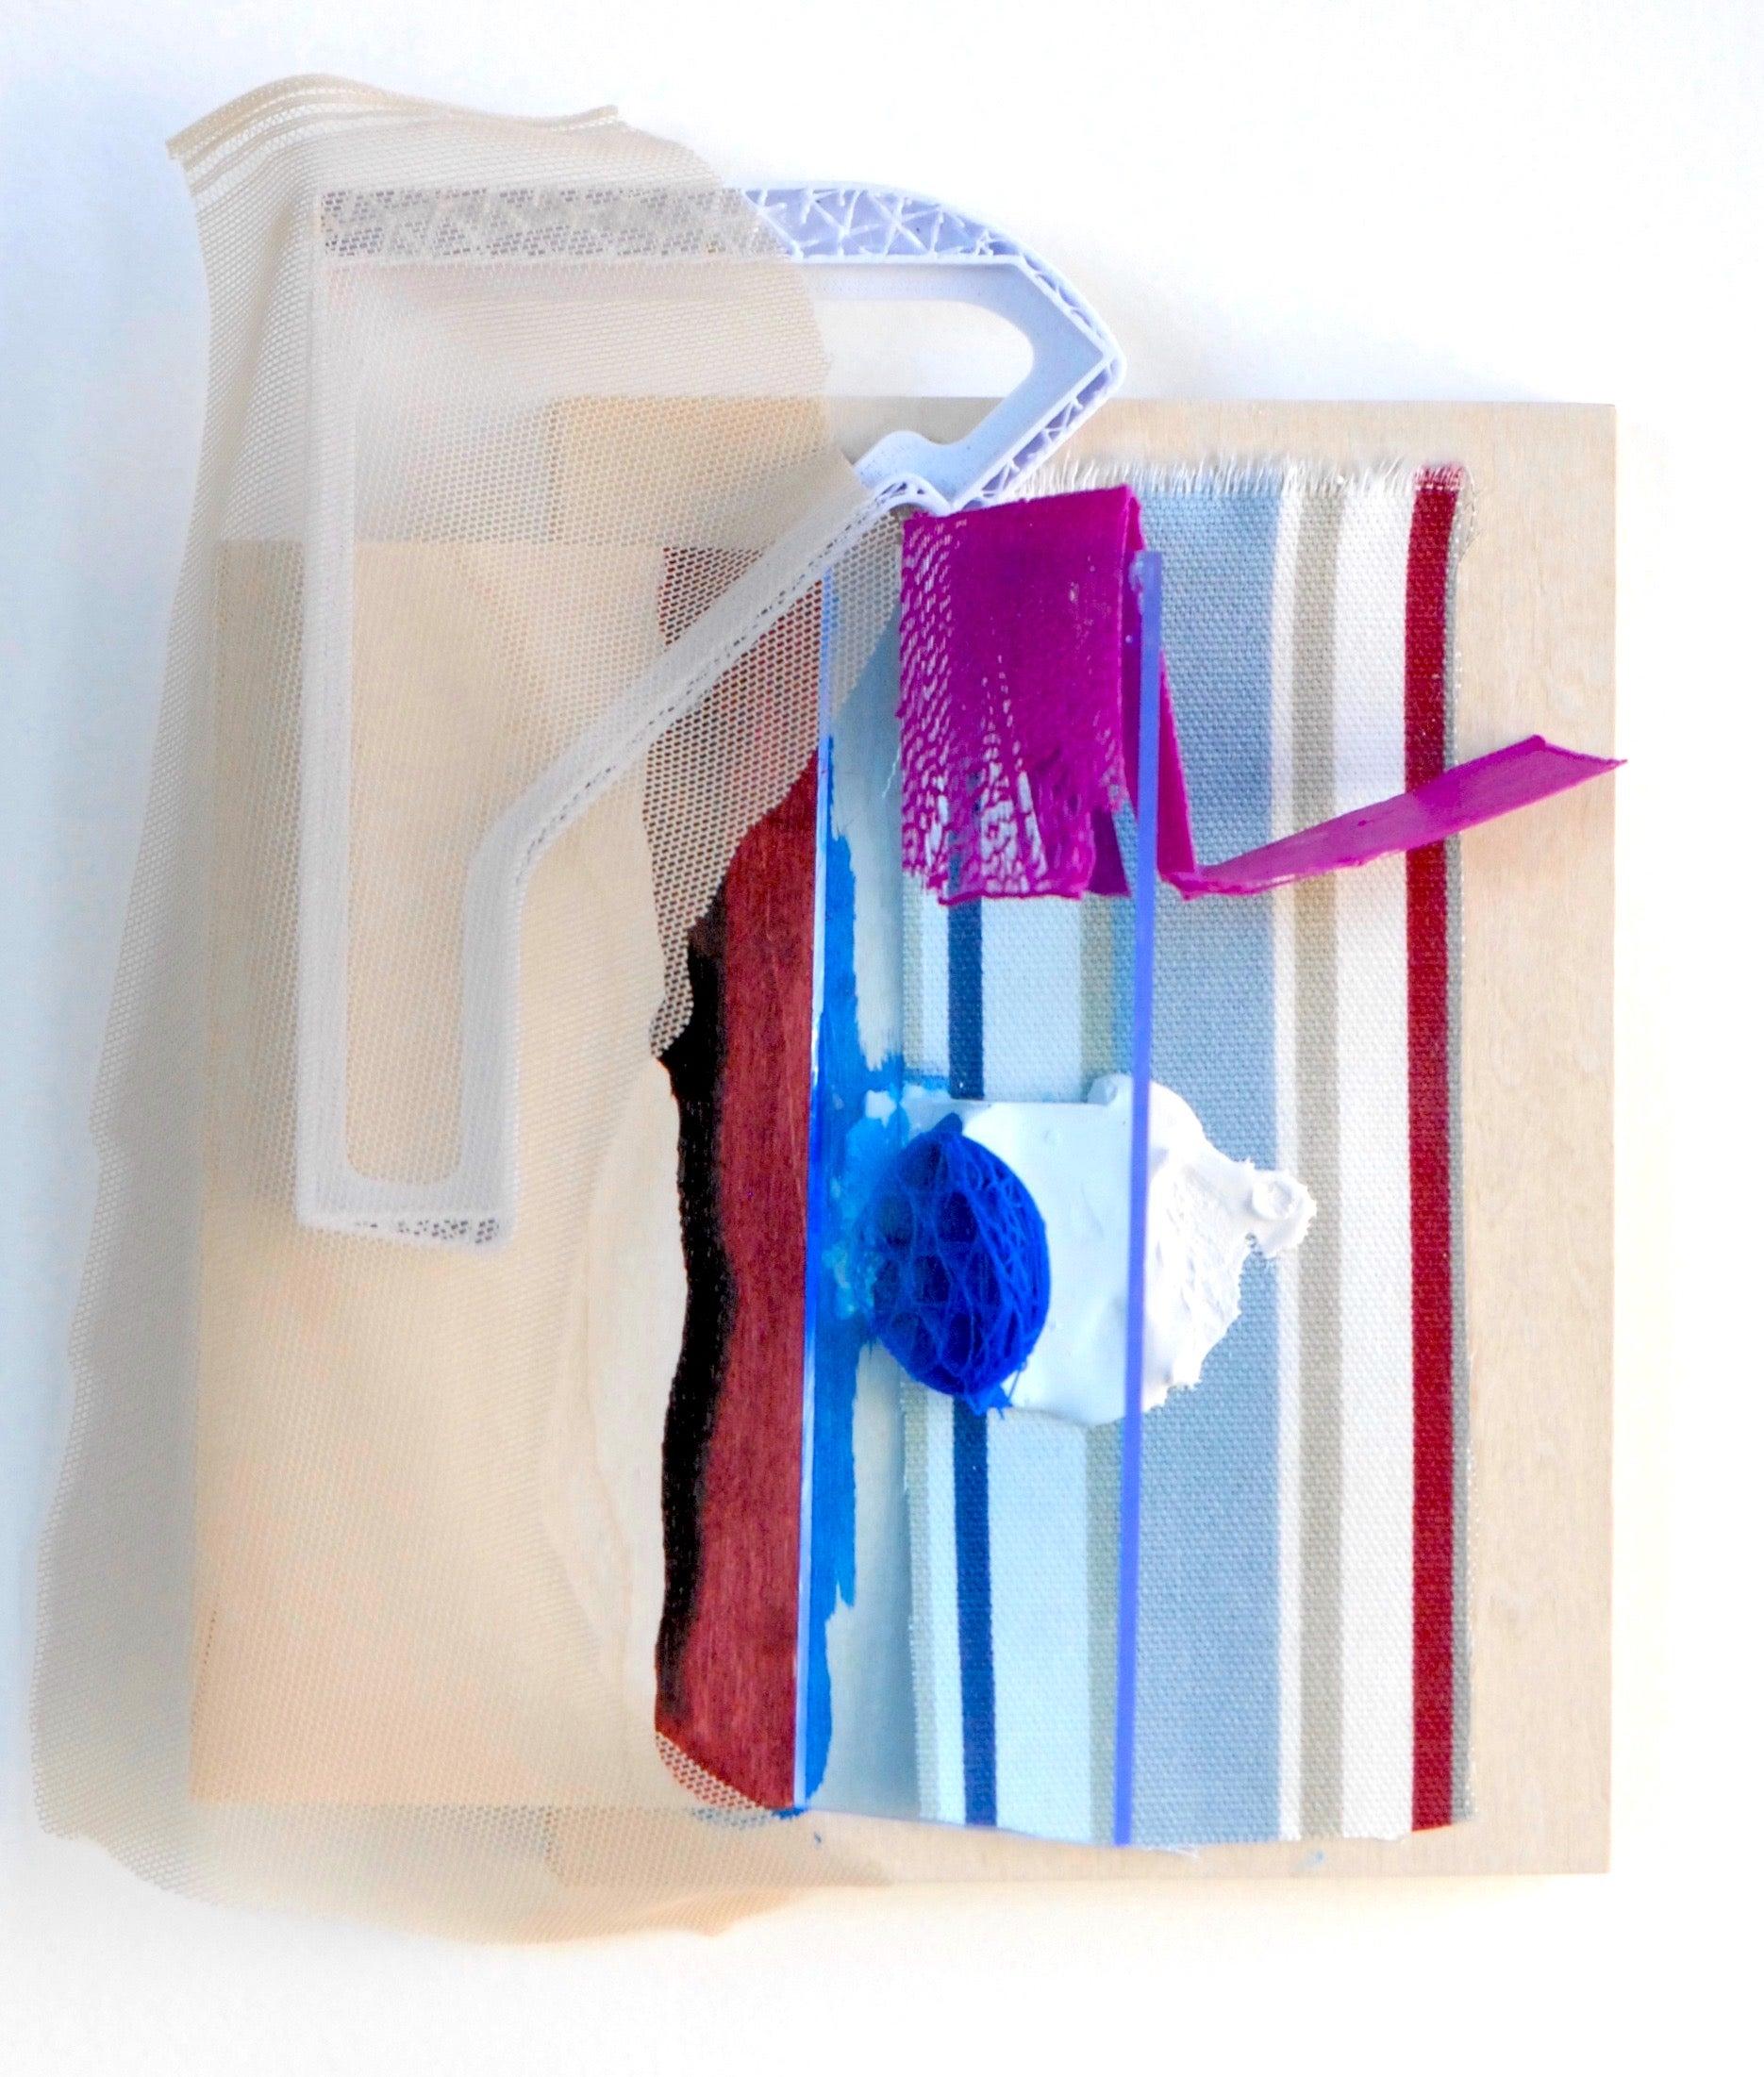 "Sylvia Schwartz 7, 2018, wood, fabric, plastic, paint, 9"" x 7.5"" x 2"""